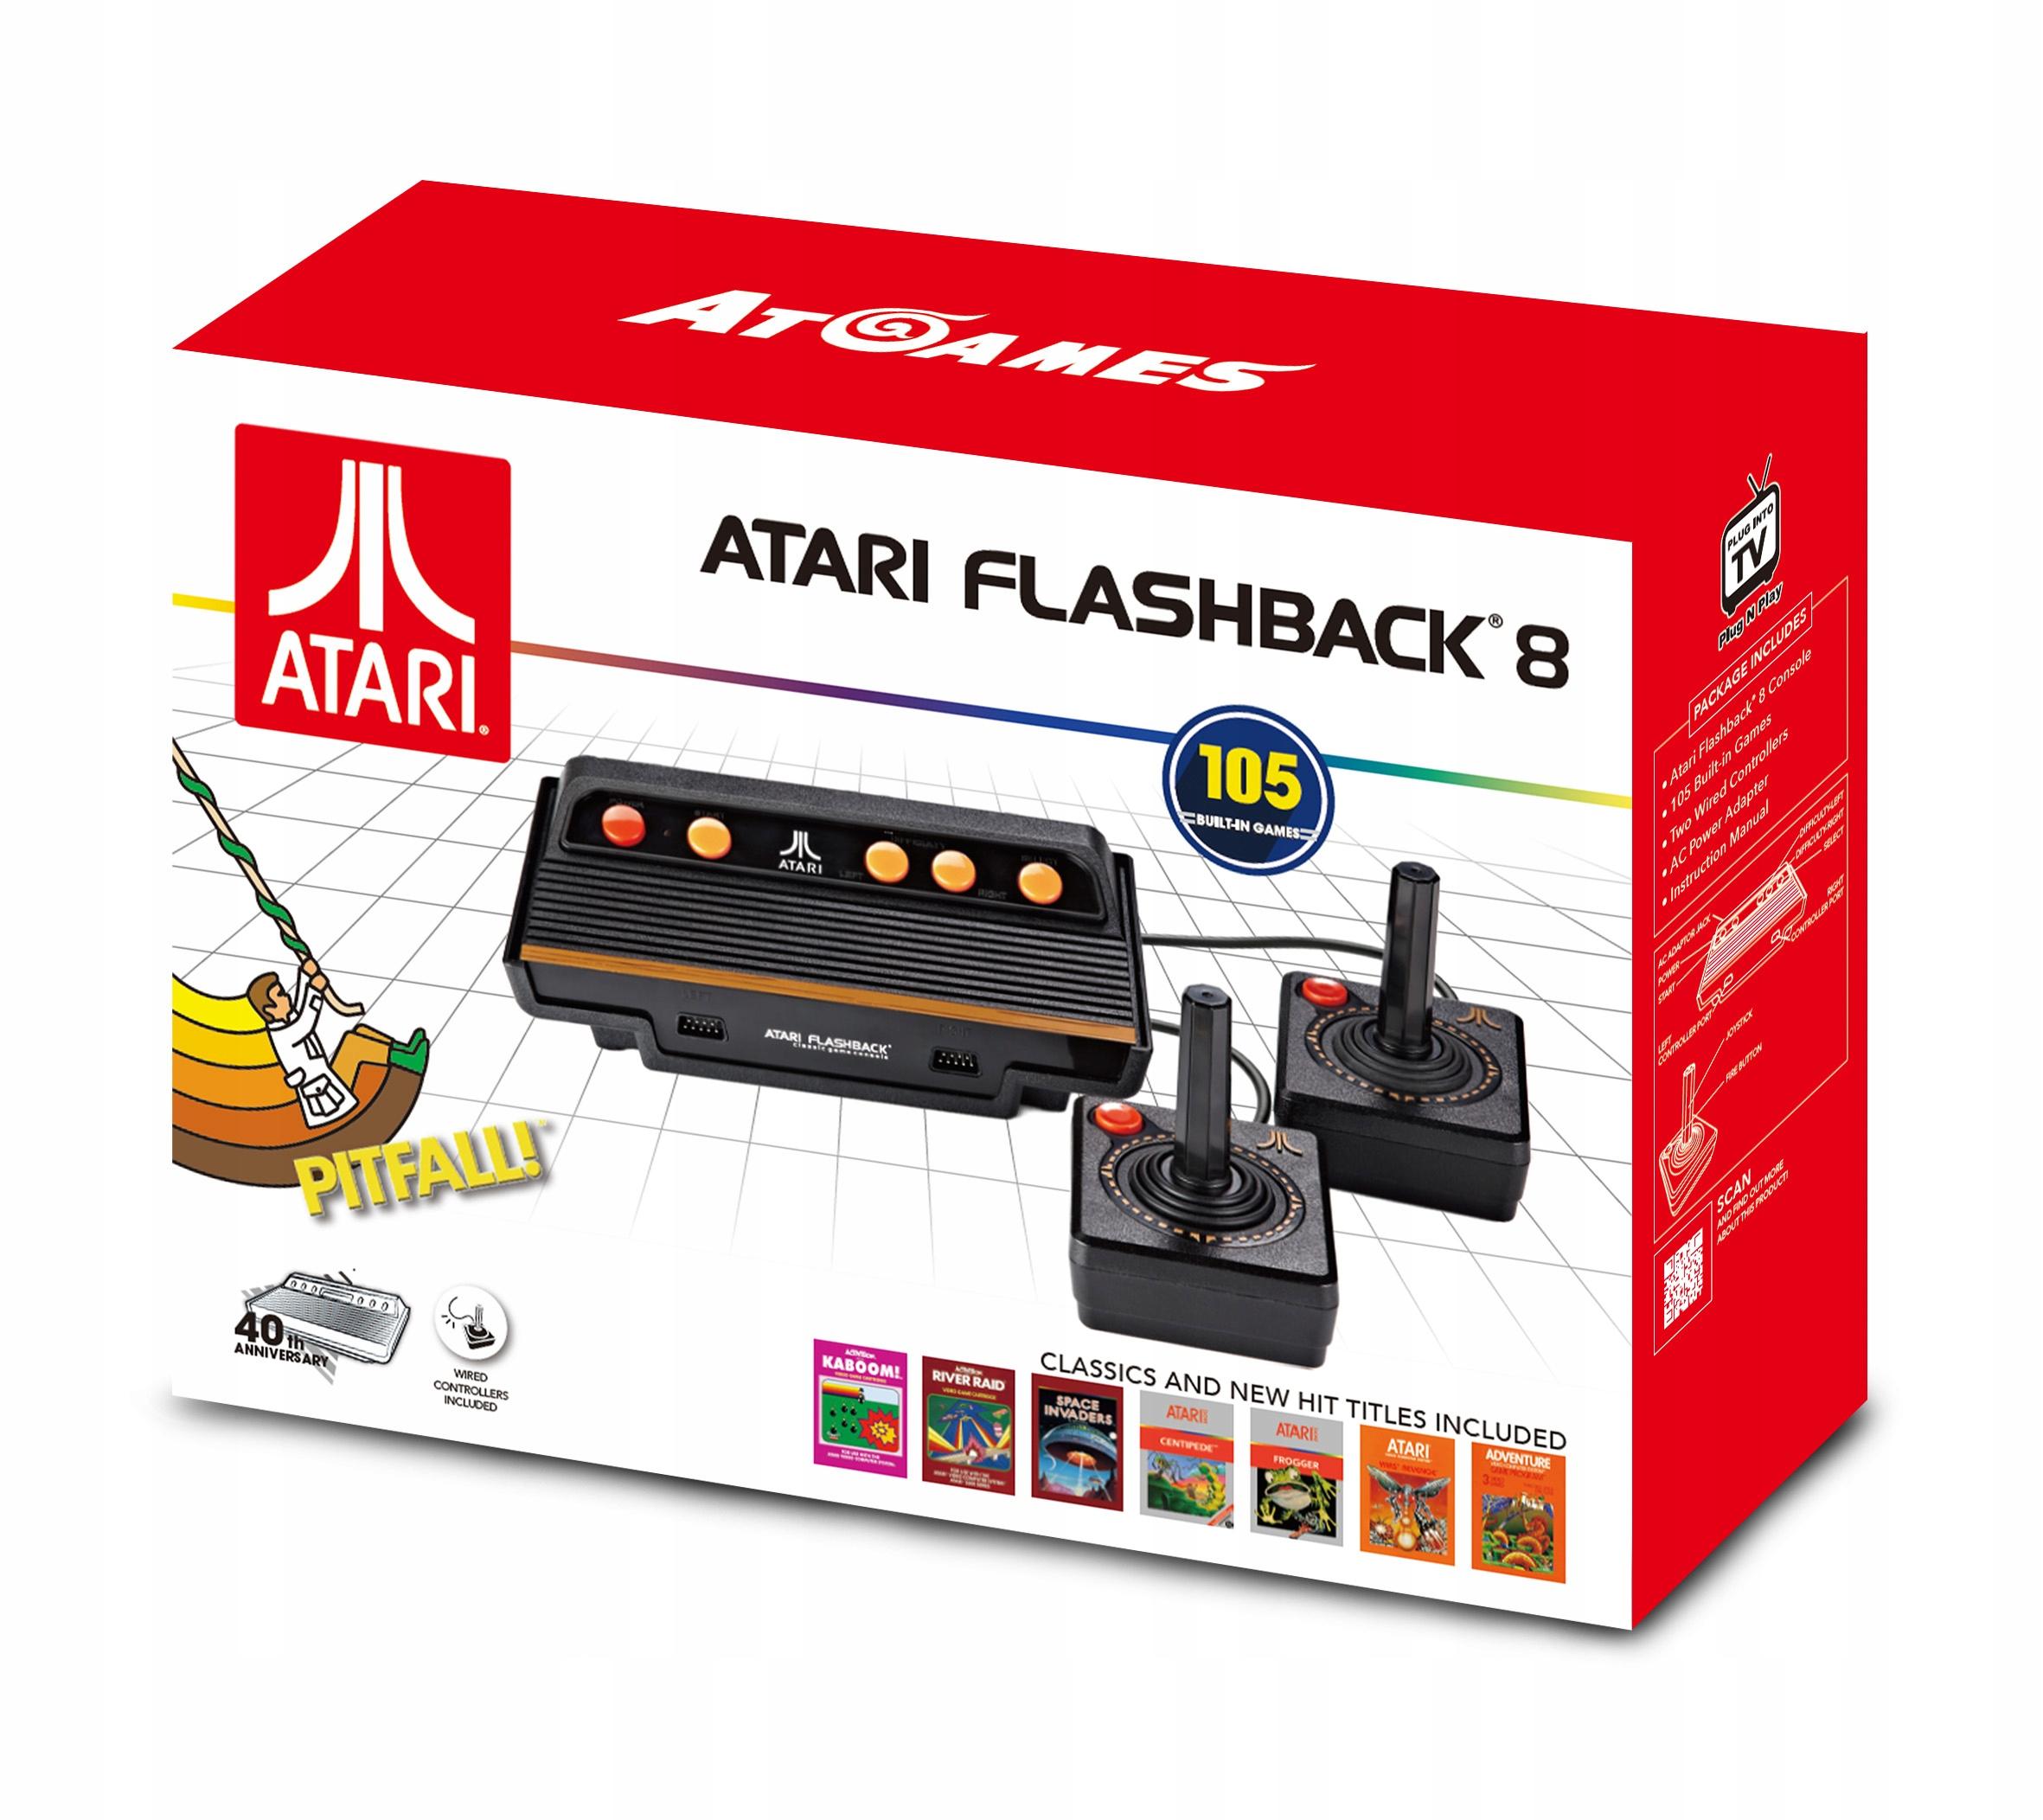 Item The ATARI Flashback 8 + 2 JOYSTICK + 105 Games